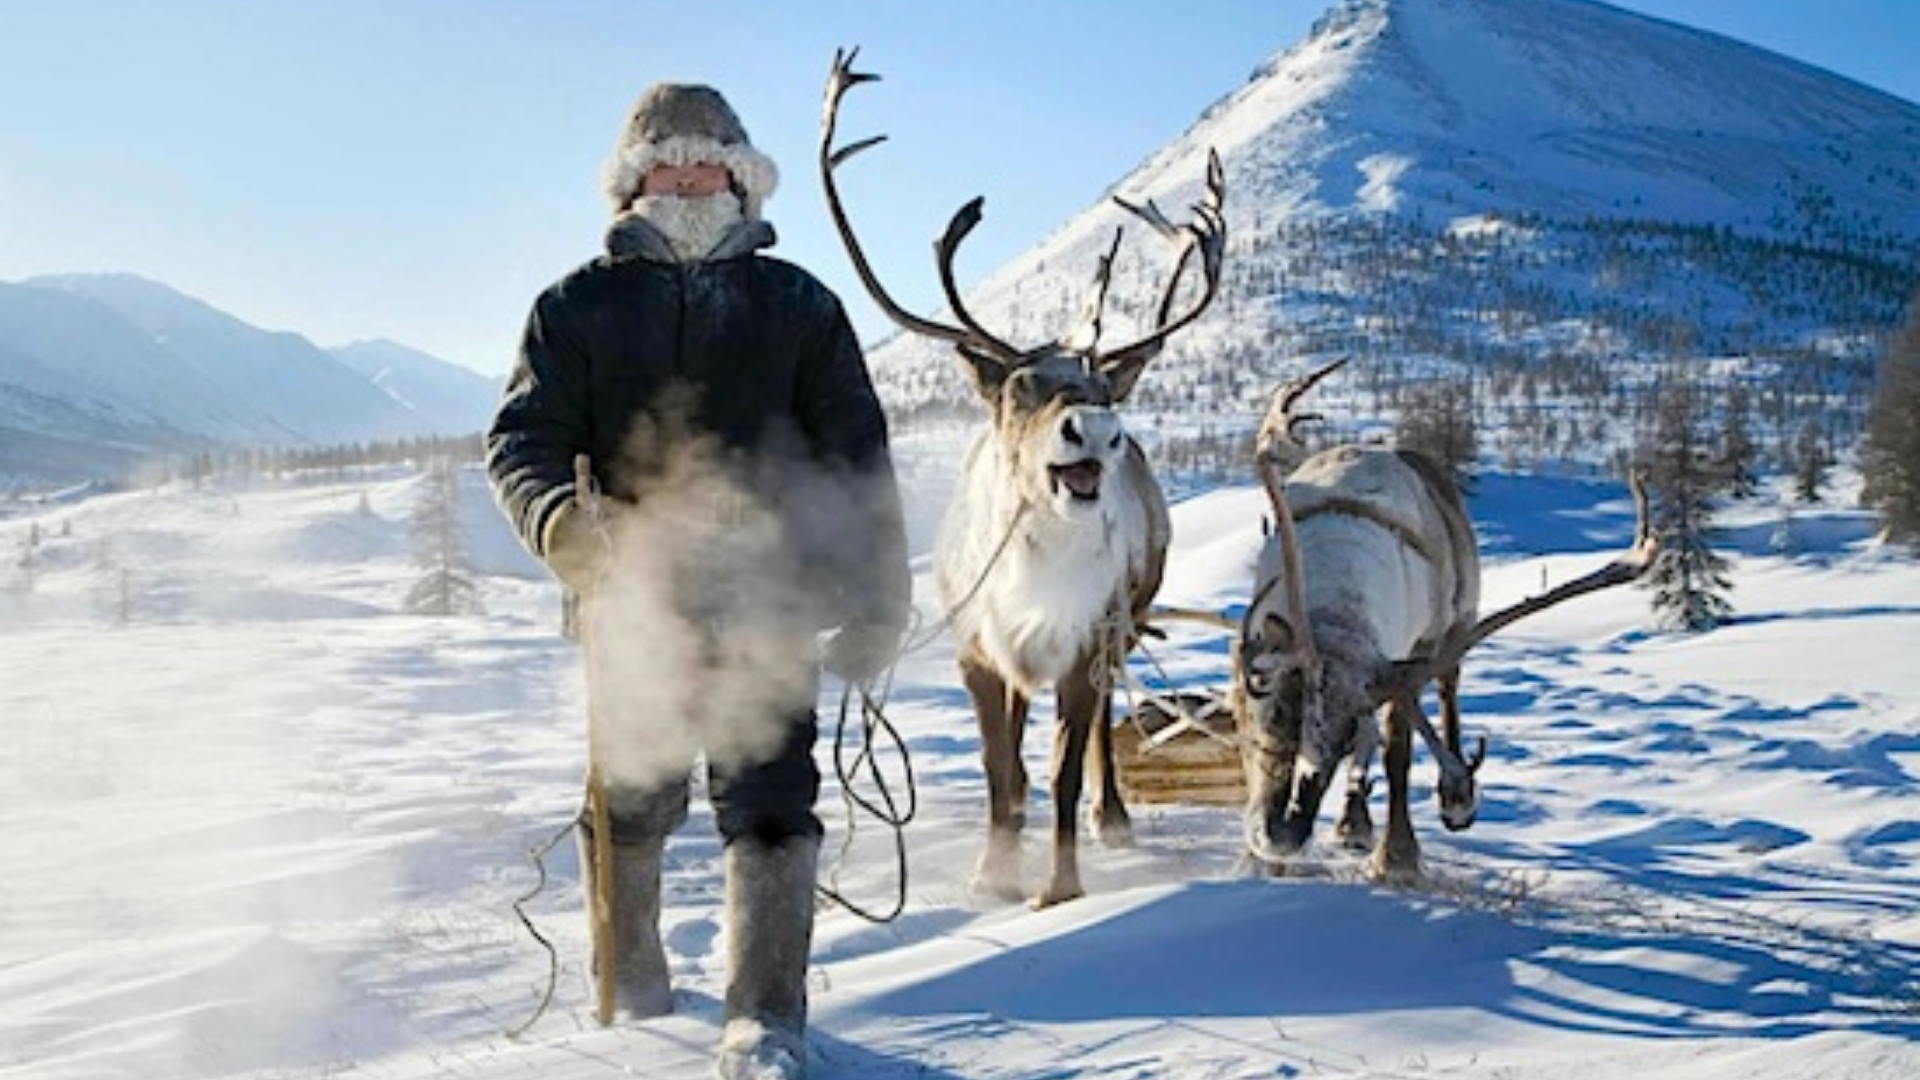 Sakha People of the Yakut Tribe, Siberia